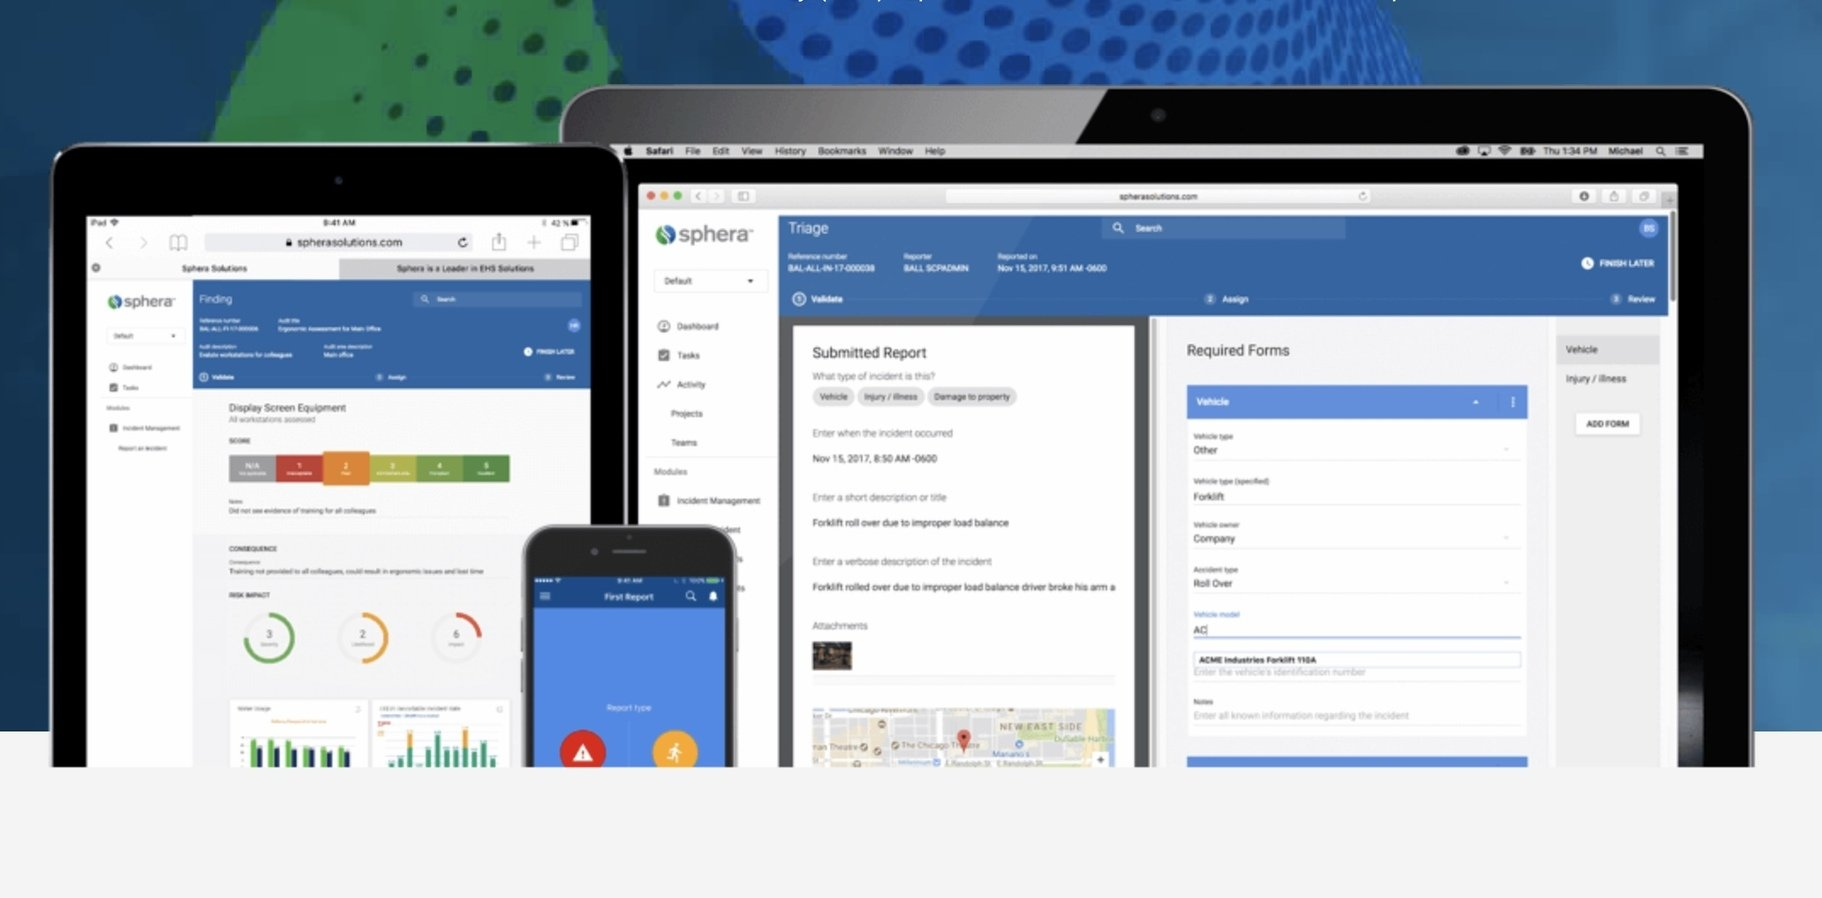 , Sphera Acquires Sustainability & Product Stewardship Software Company Thinkstep, The Circular Economy